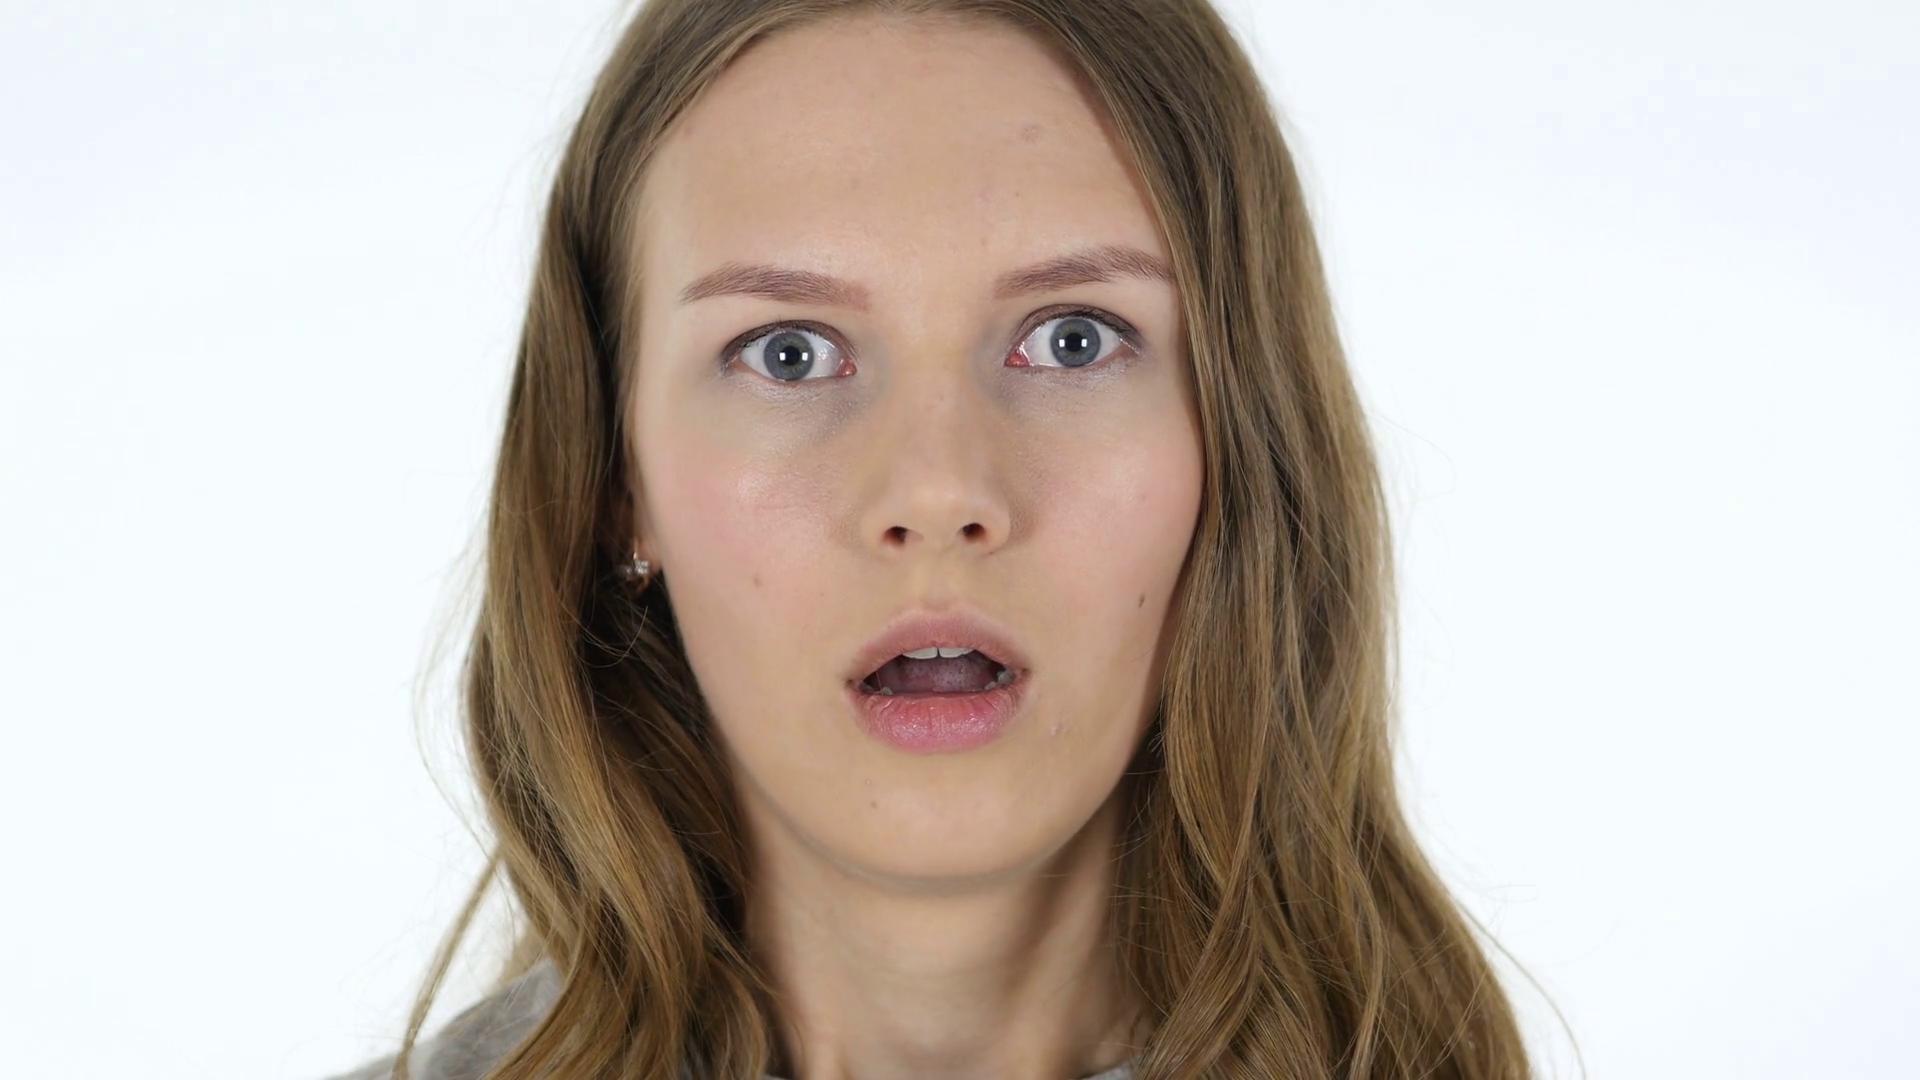 HD & 4K Shocked Face Videos - VideoBlocks: Royalty-Free Shocked Face ...